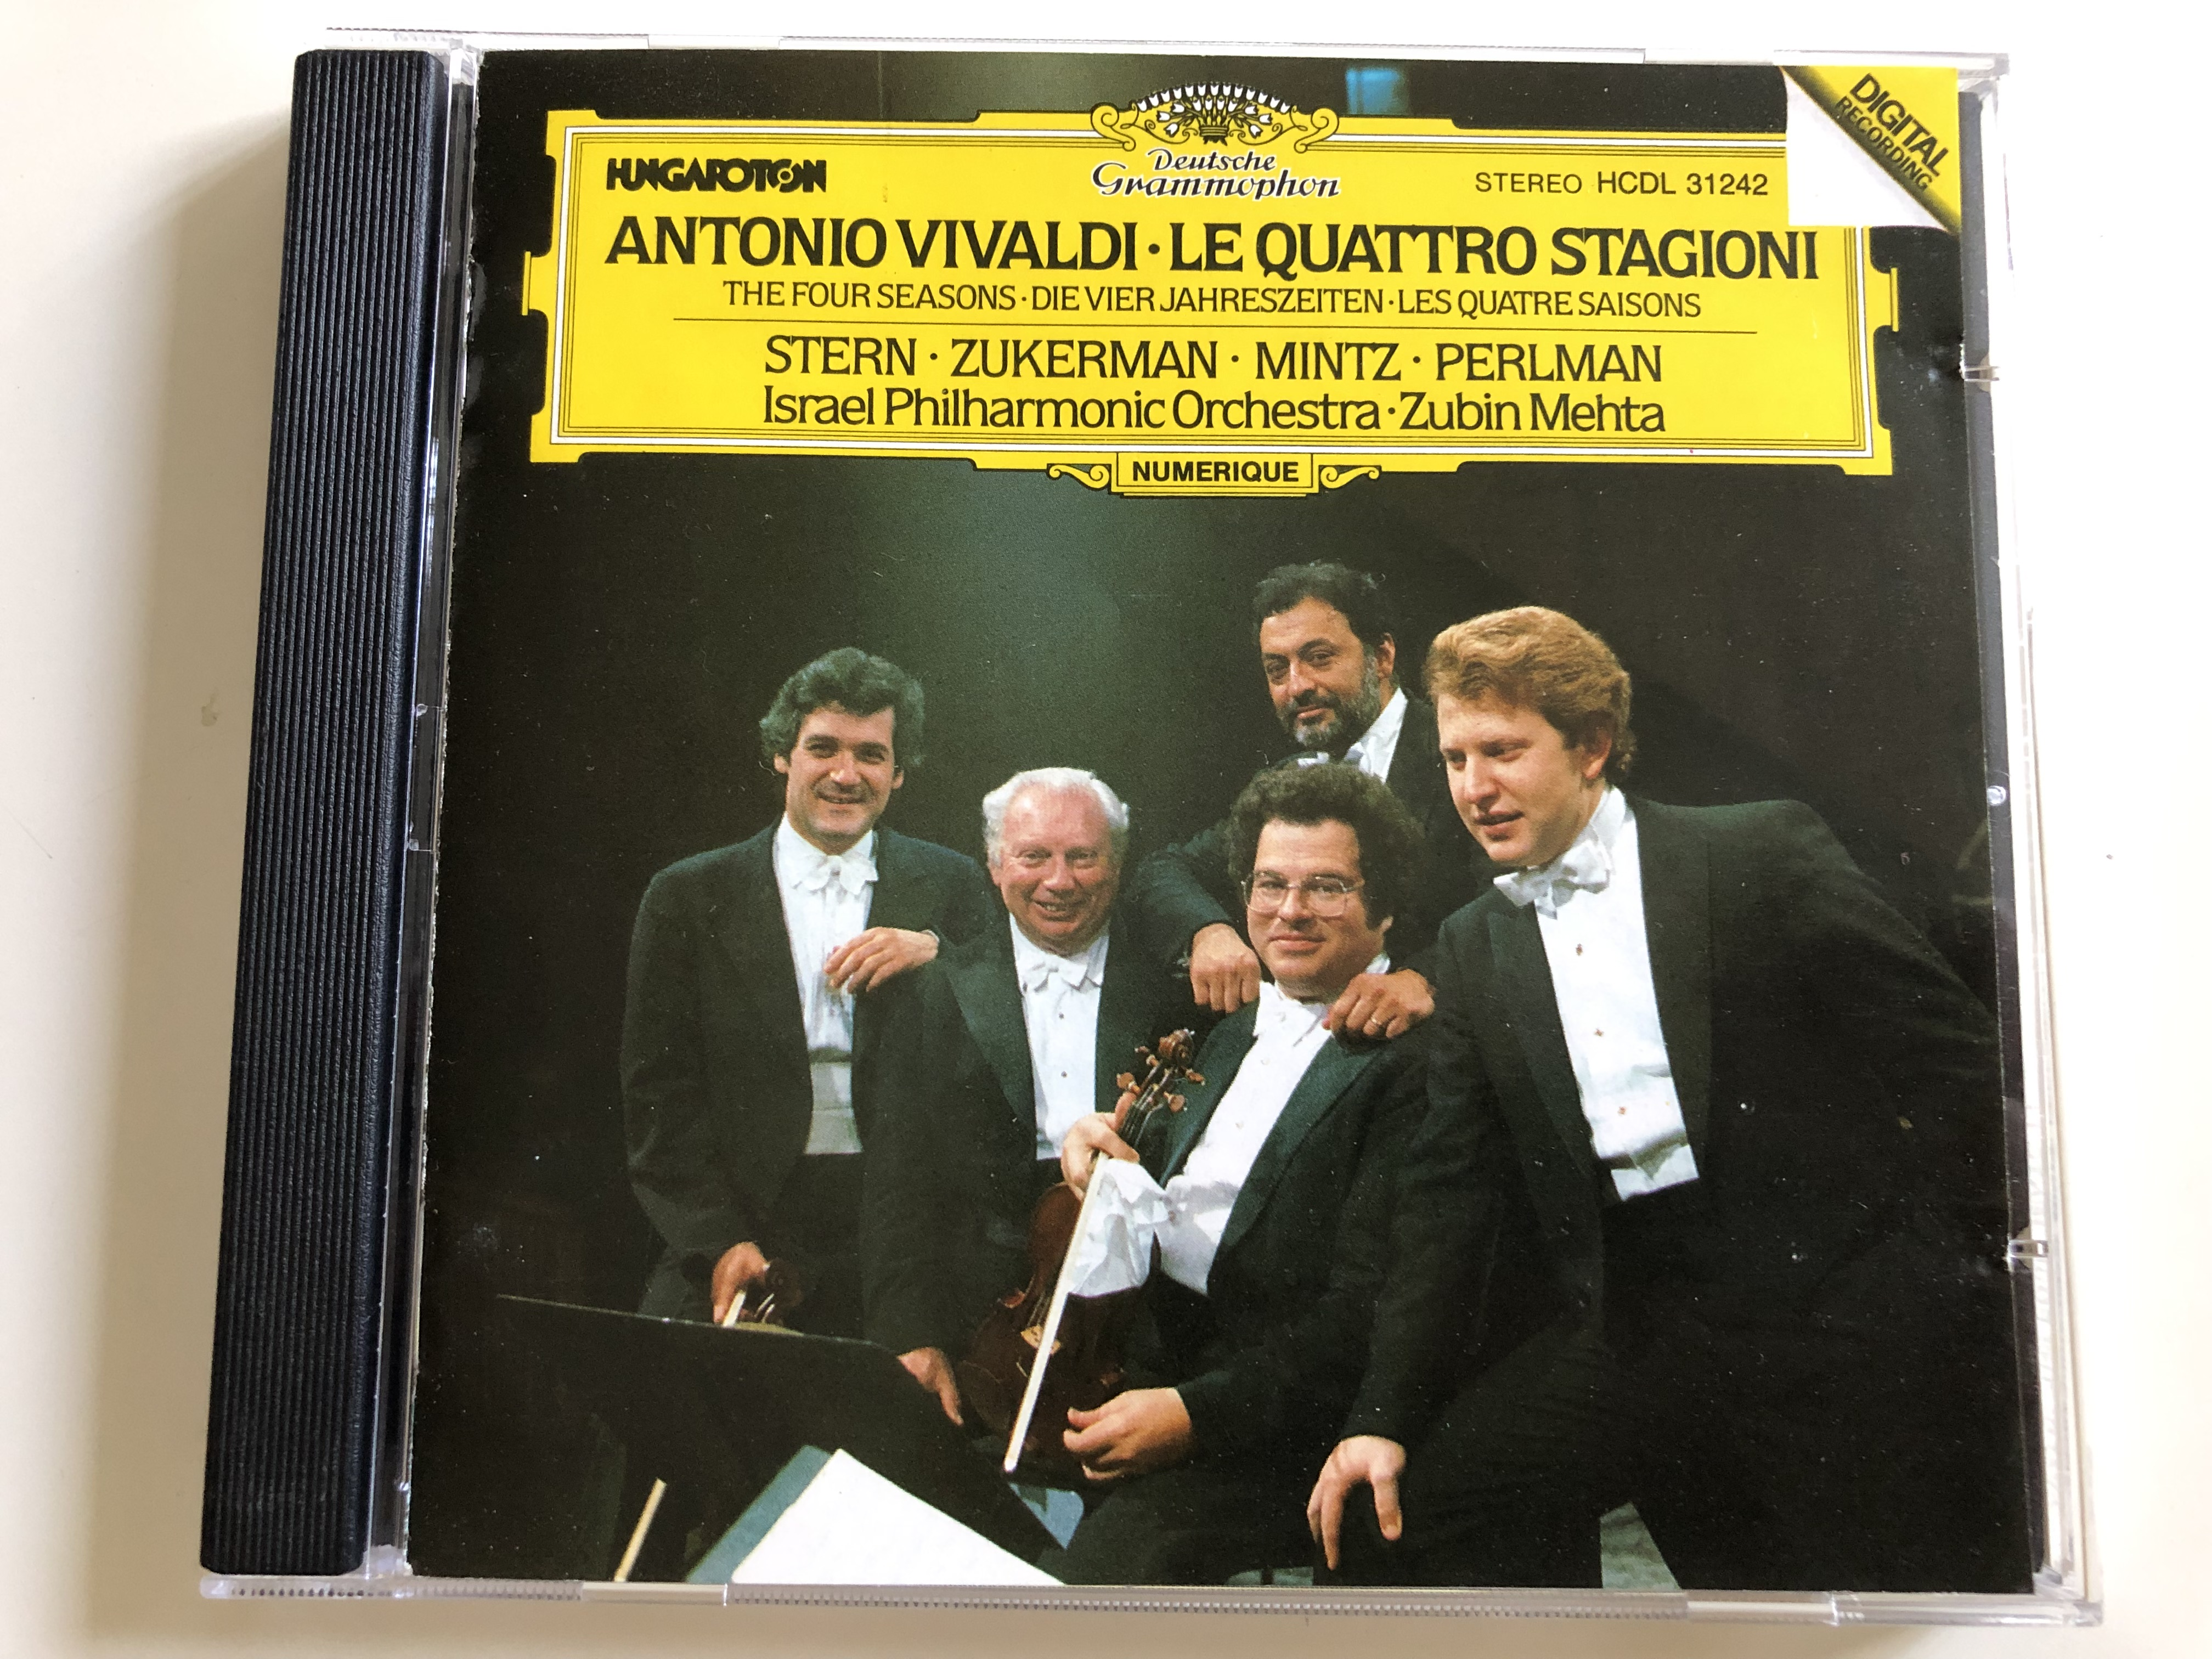 antonio-vivaldi-le-quattro-stagioni-the-four-seasons-stern-zukerman-mintz-perlman-israel-philharmonic-orchestra-conducted-by-zubin-mehta-hungaroton-audio-cd-1983-hcdl-31242-1-.jpg